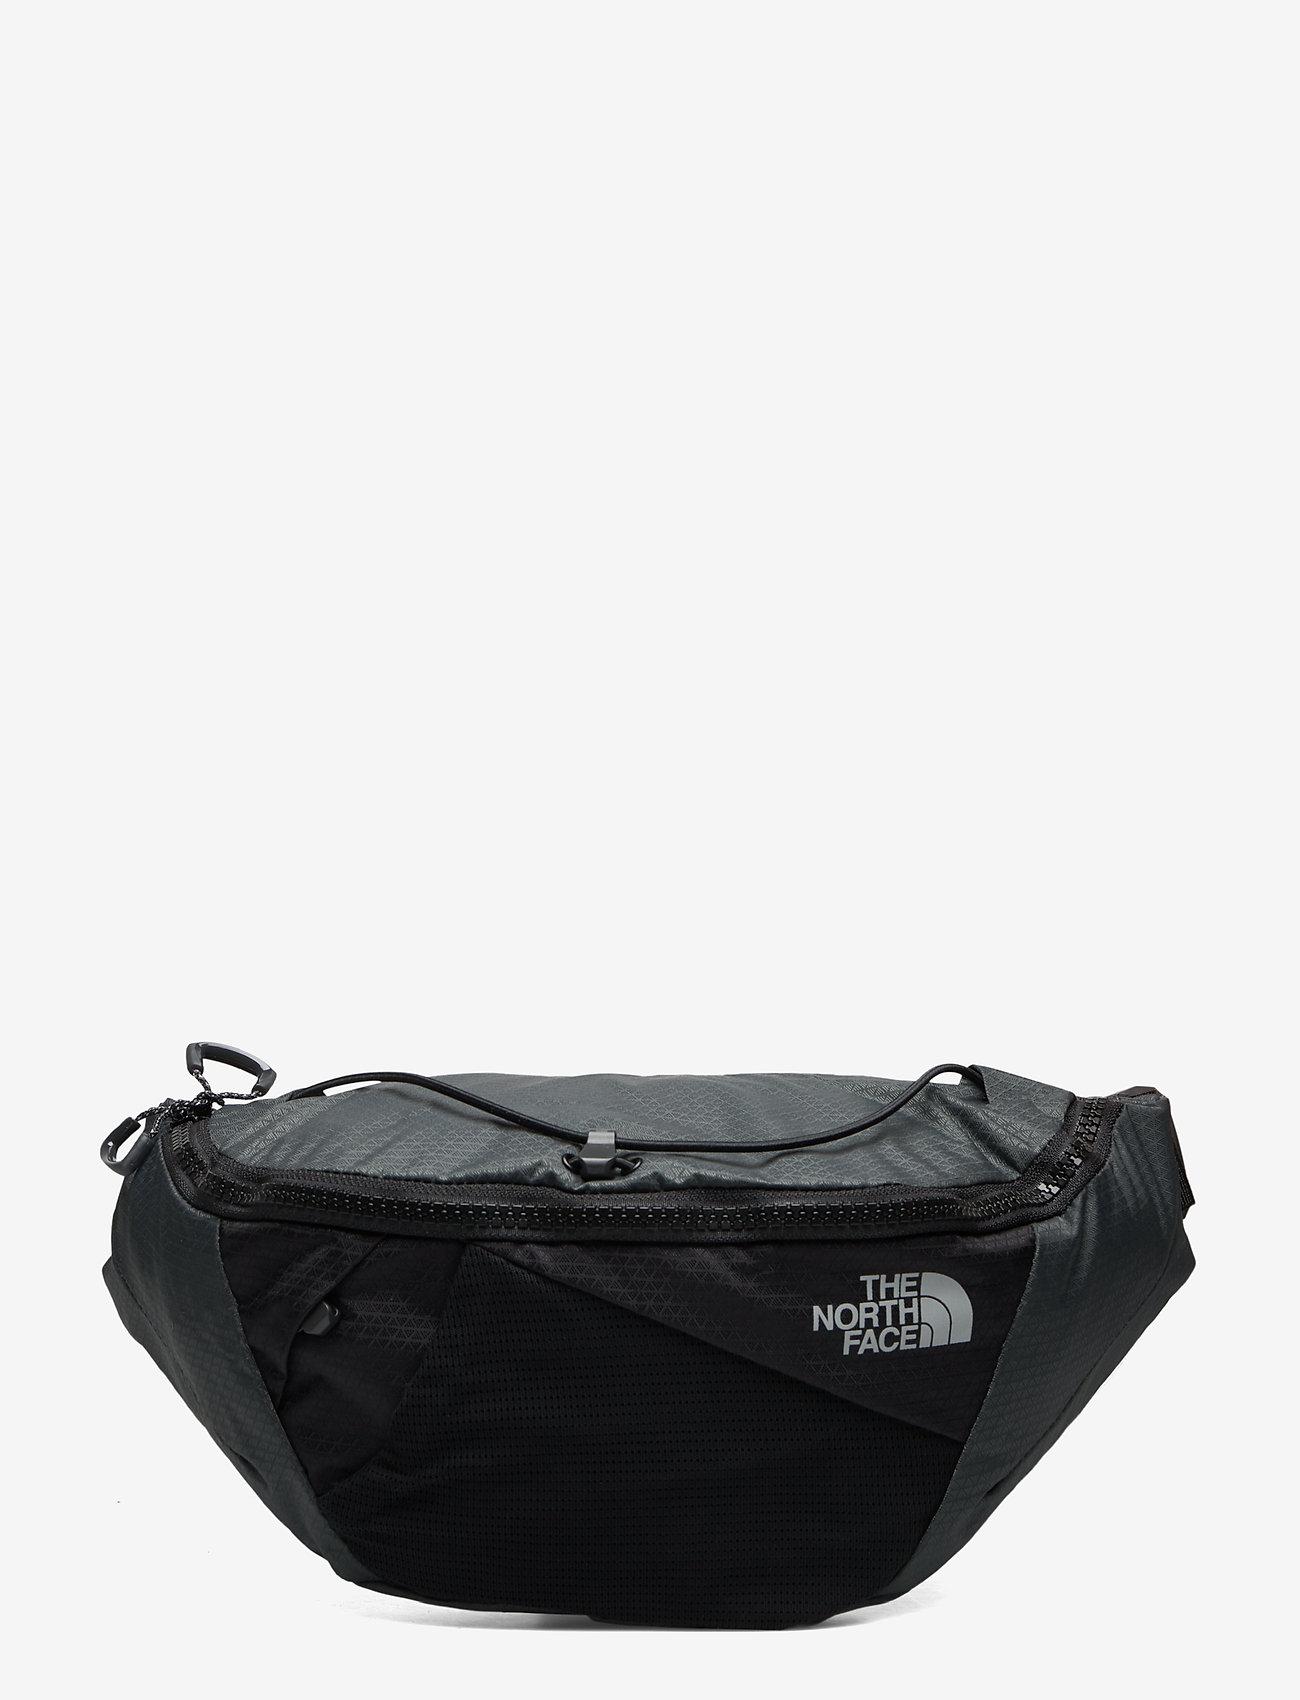 The North Face - LUMBNICAL - S - sacs banane - asphalt grey-tnf black - 0